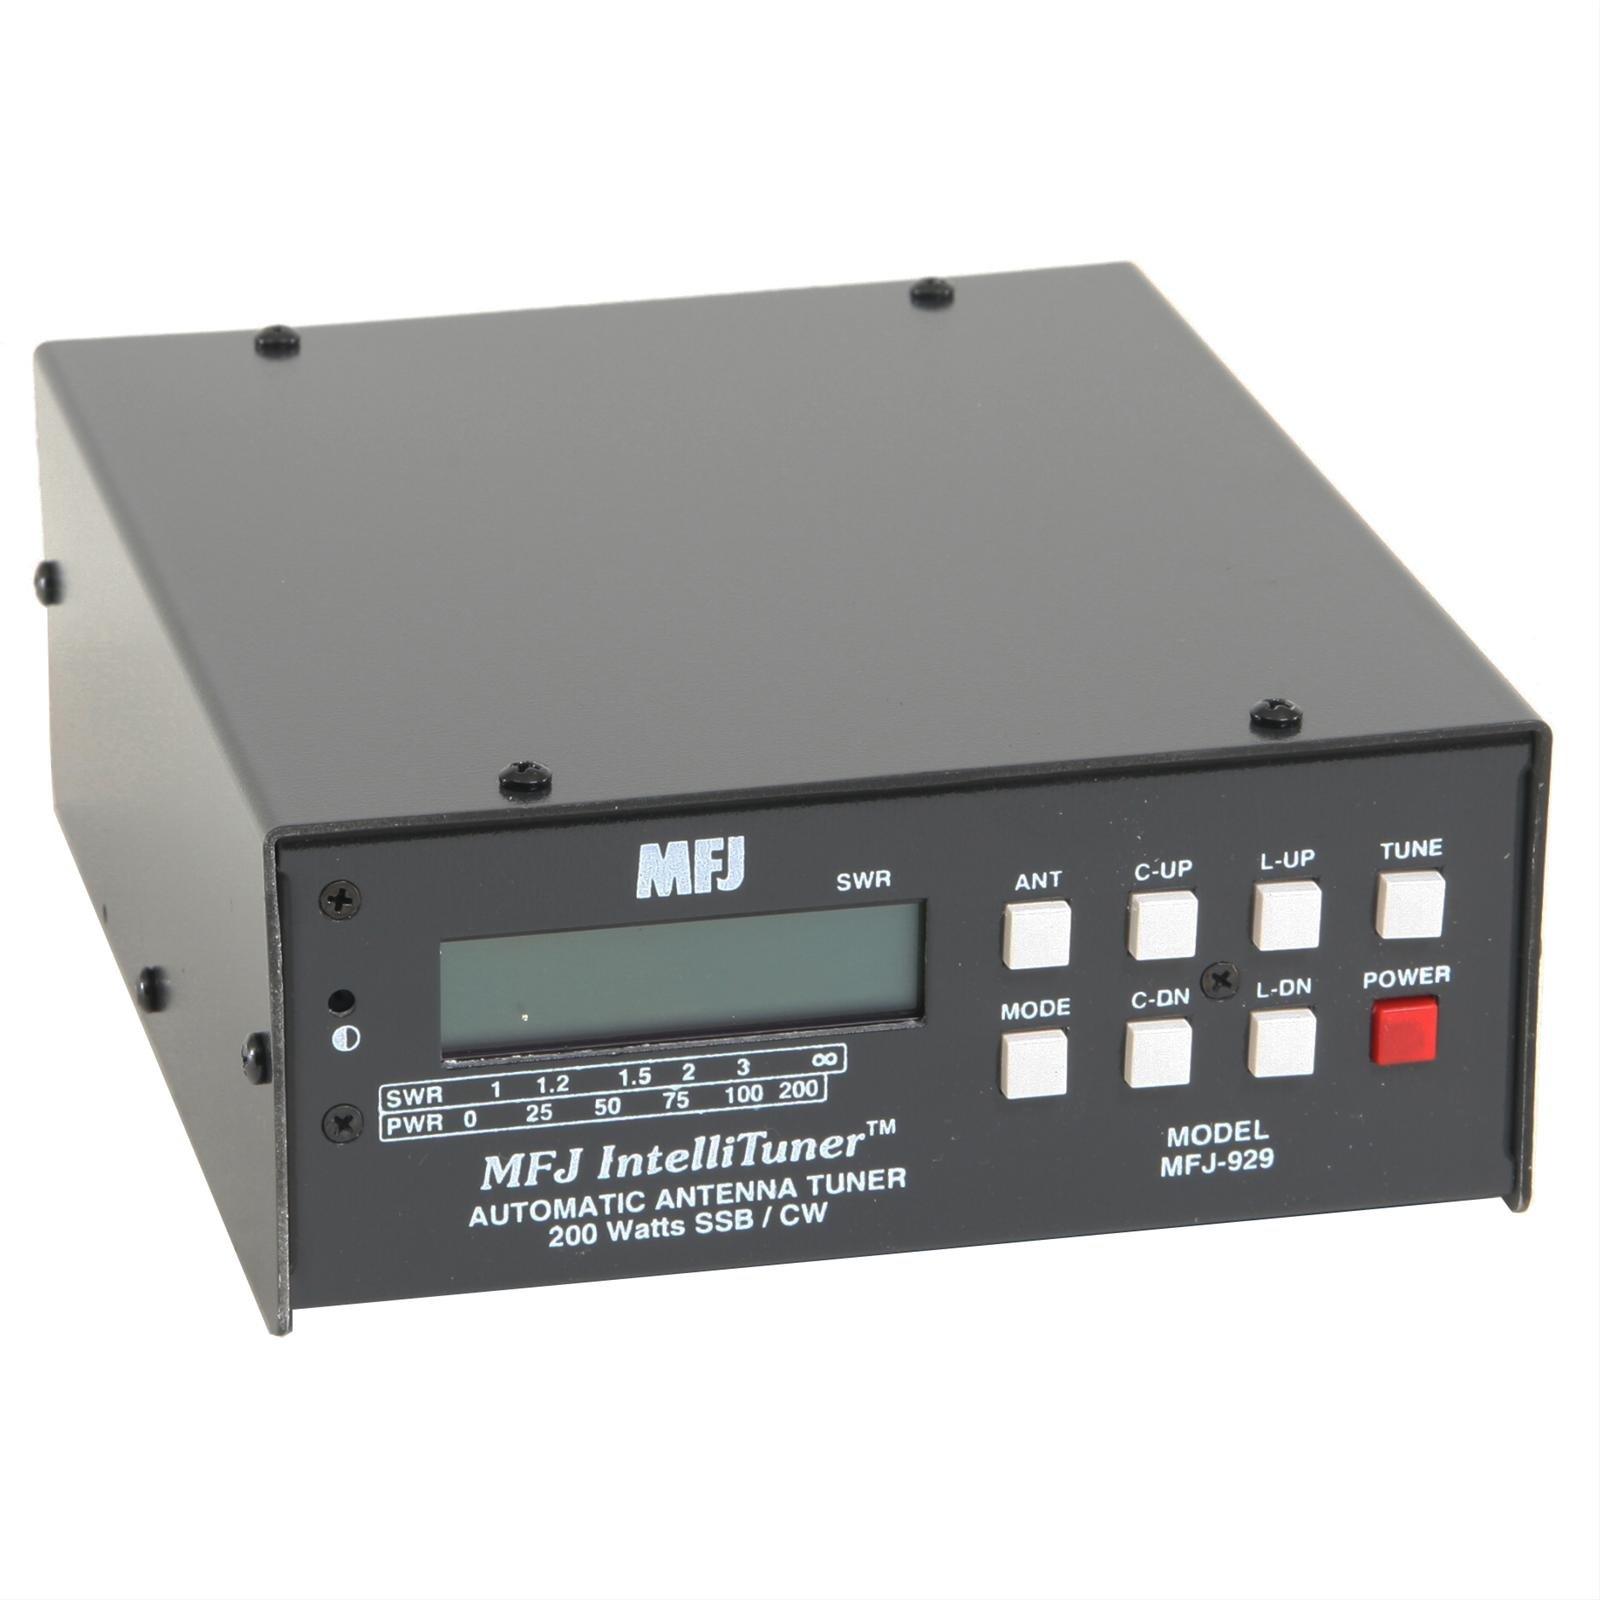 MFJ-929 Auto tuner, 200W by MFJ (Image #1)